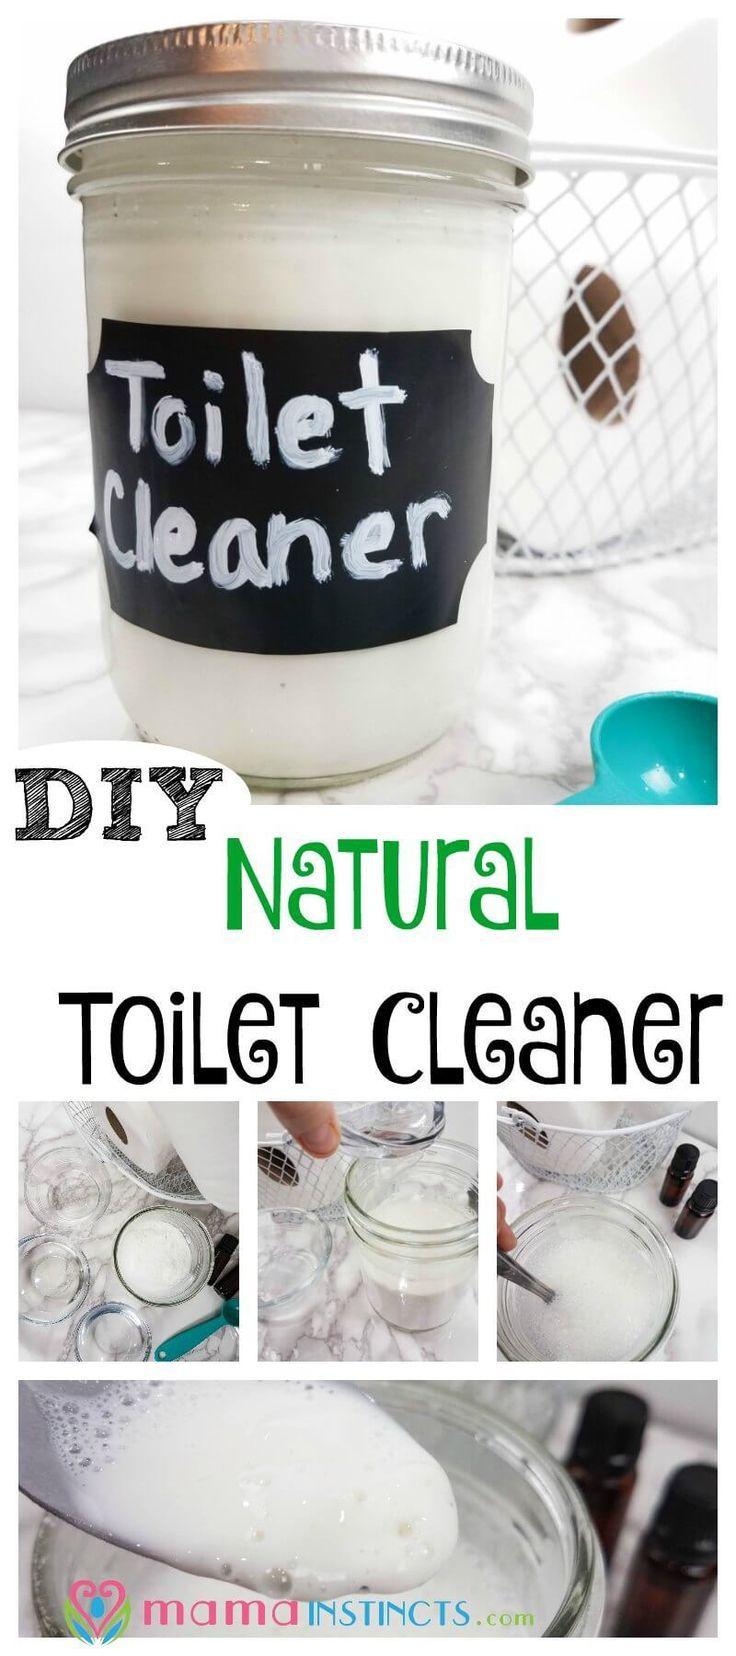 Diy natural toilet cleaner natural toilet cleaner